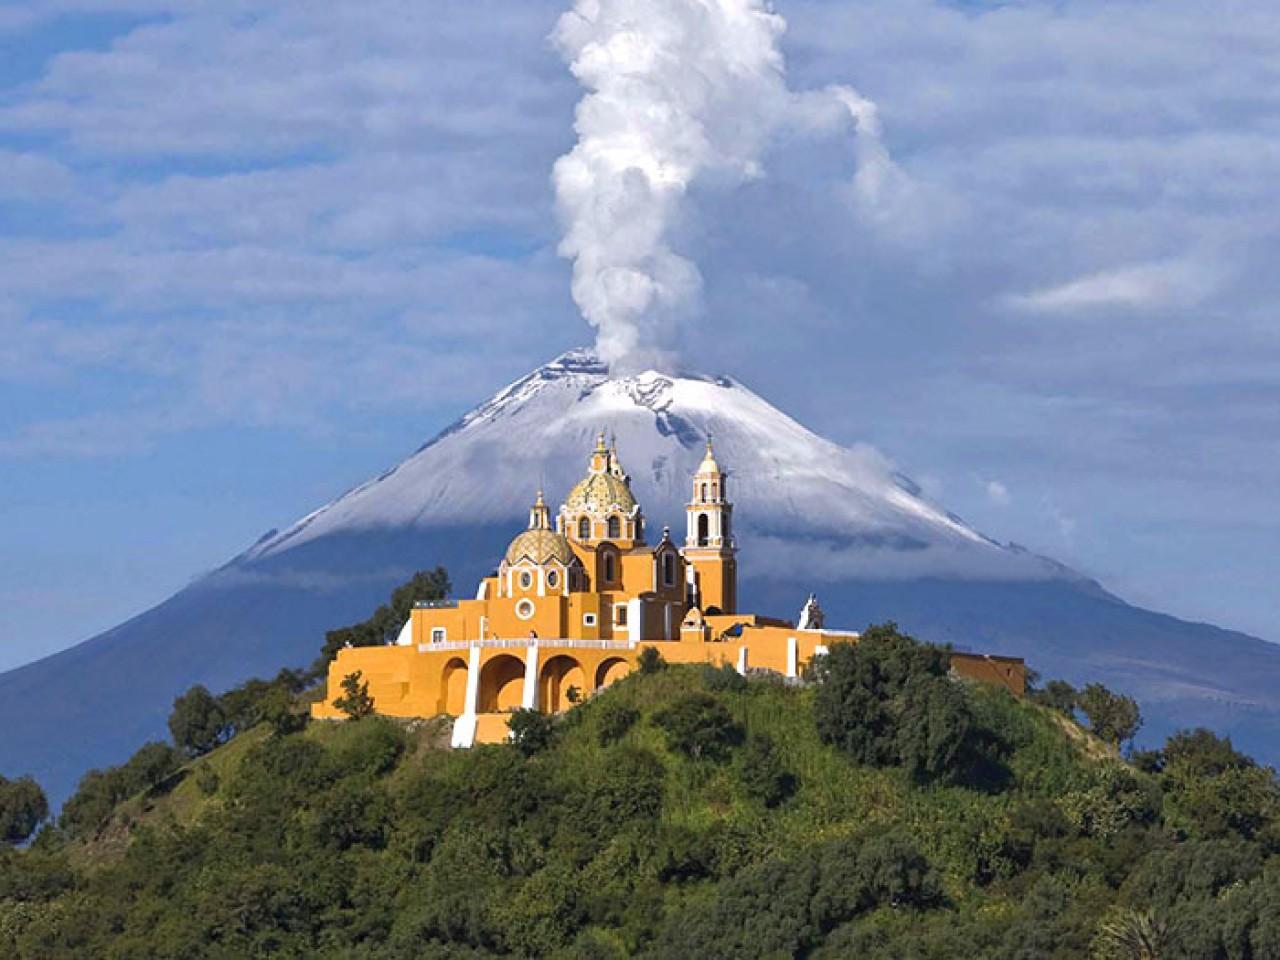 Piramide di Cholula e Puebla